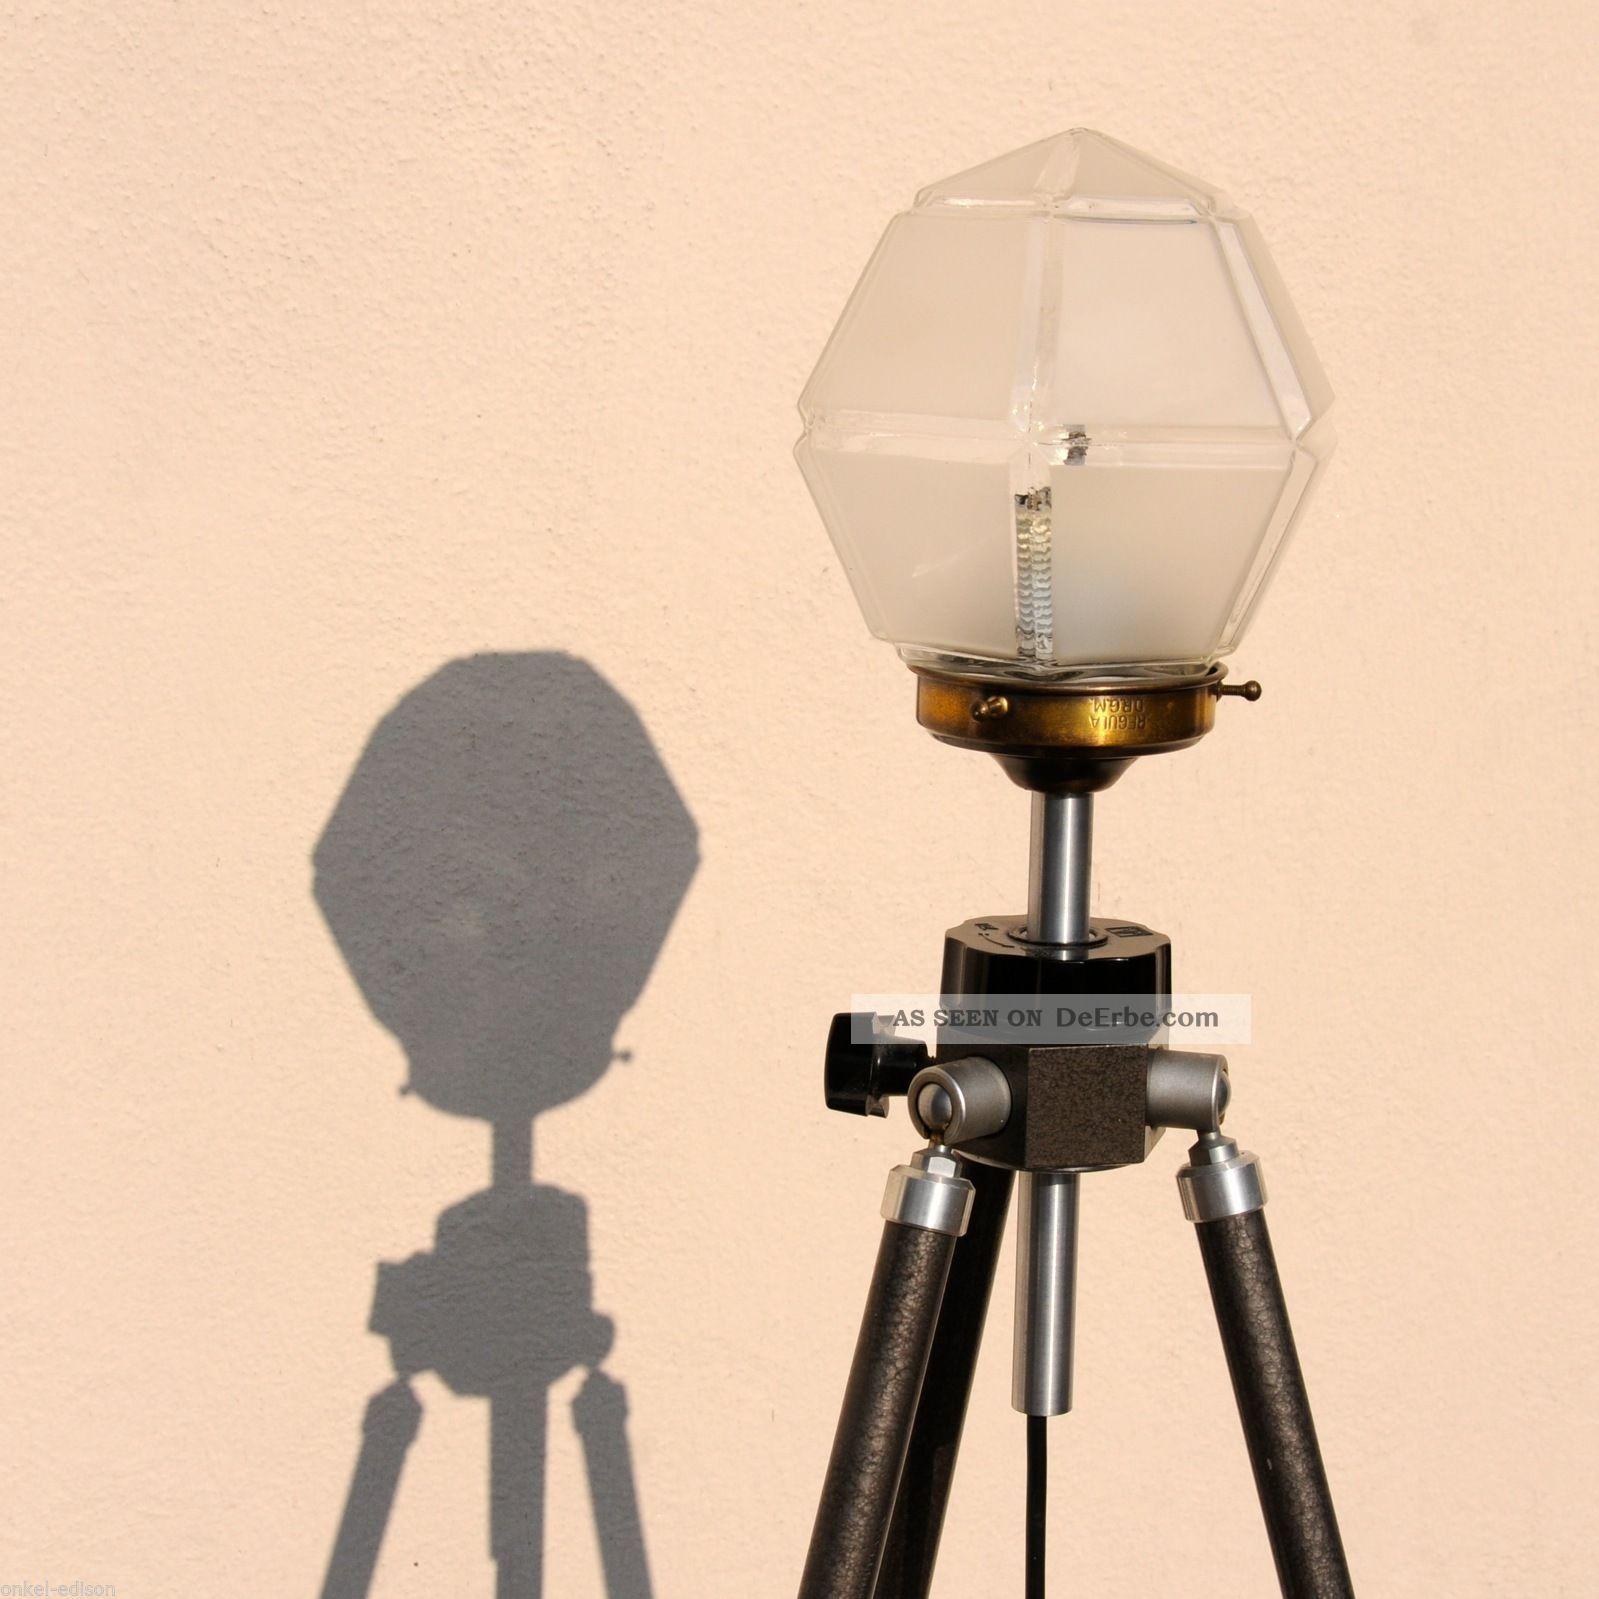 Stehlampe Industriedesign Tripod Stehlampe Hexagon Retro Lampe